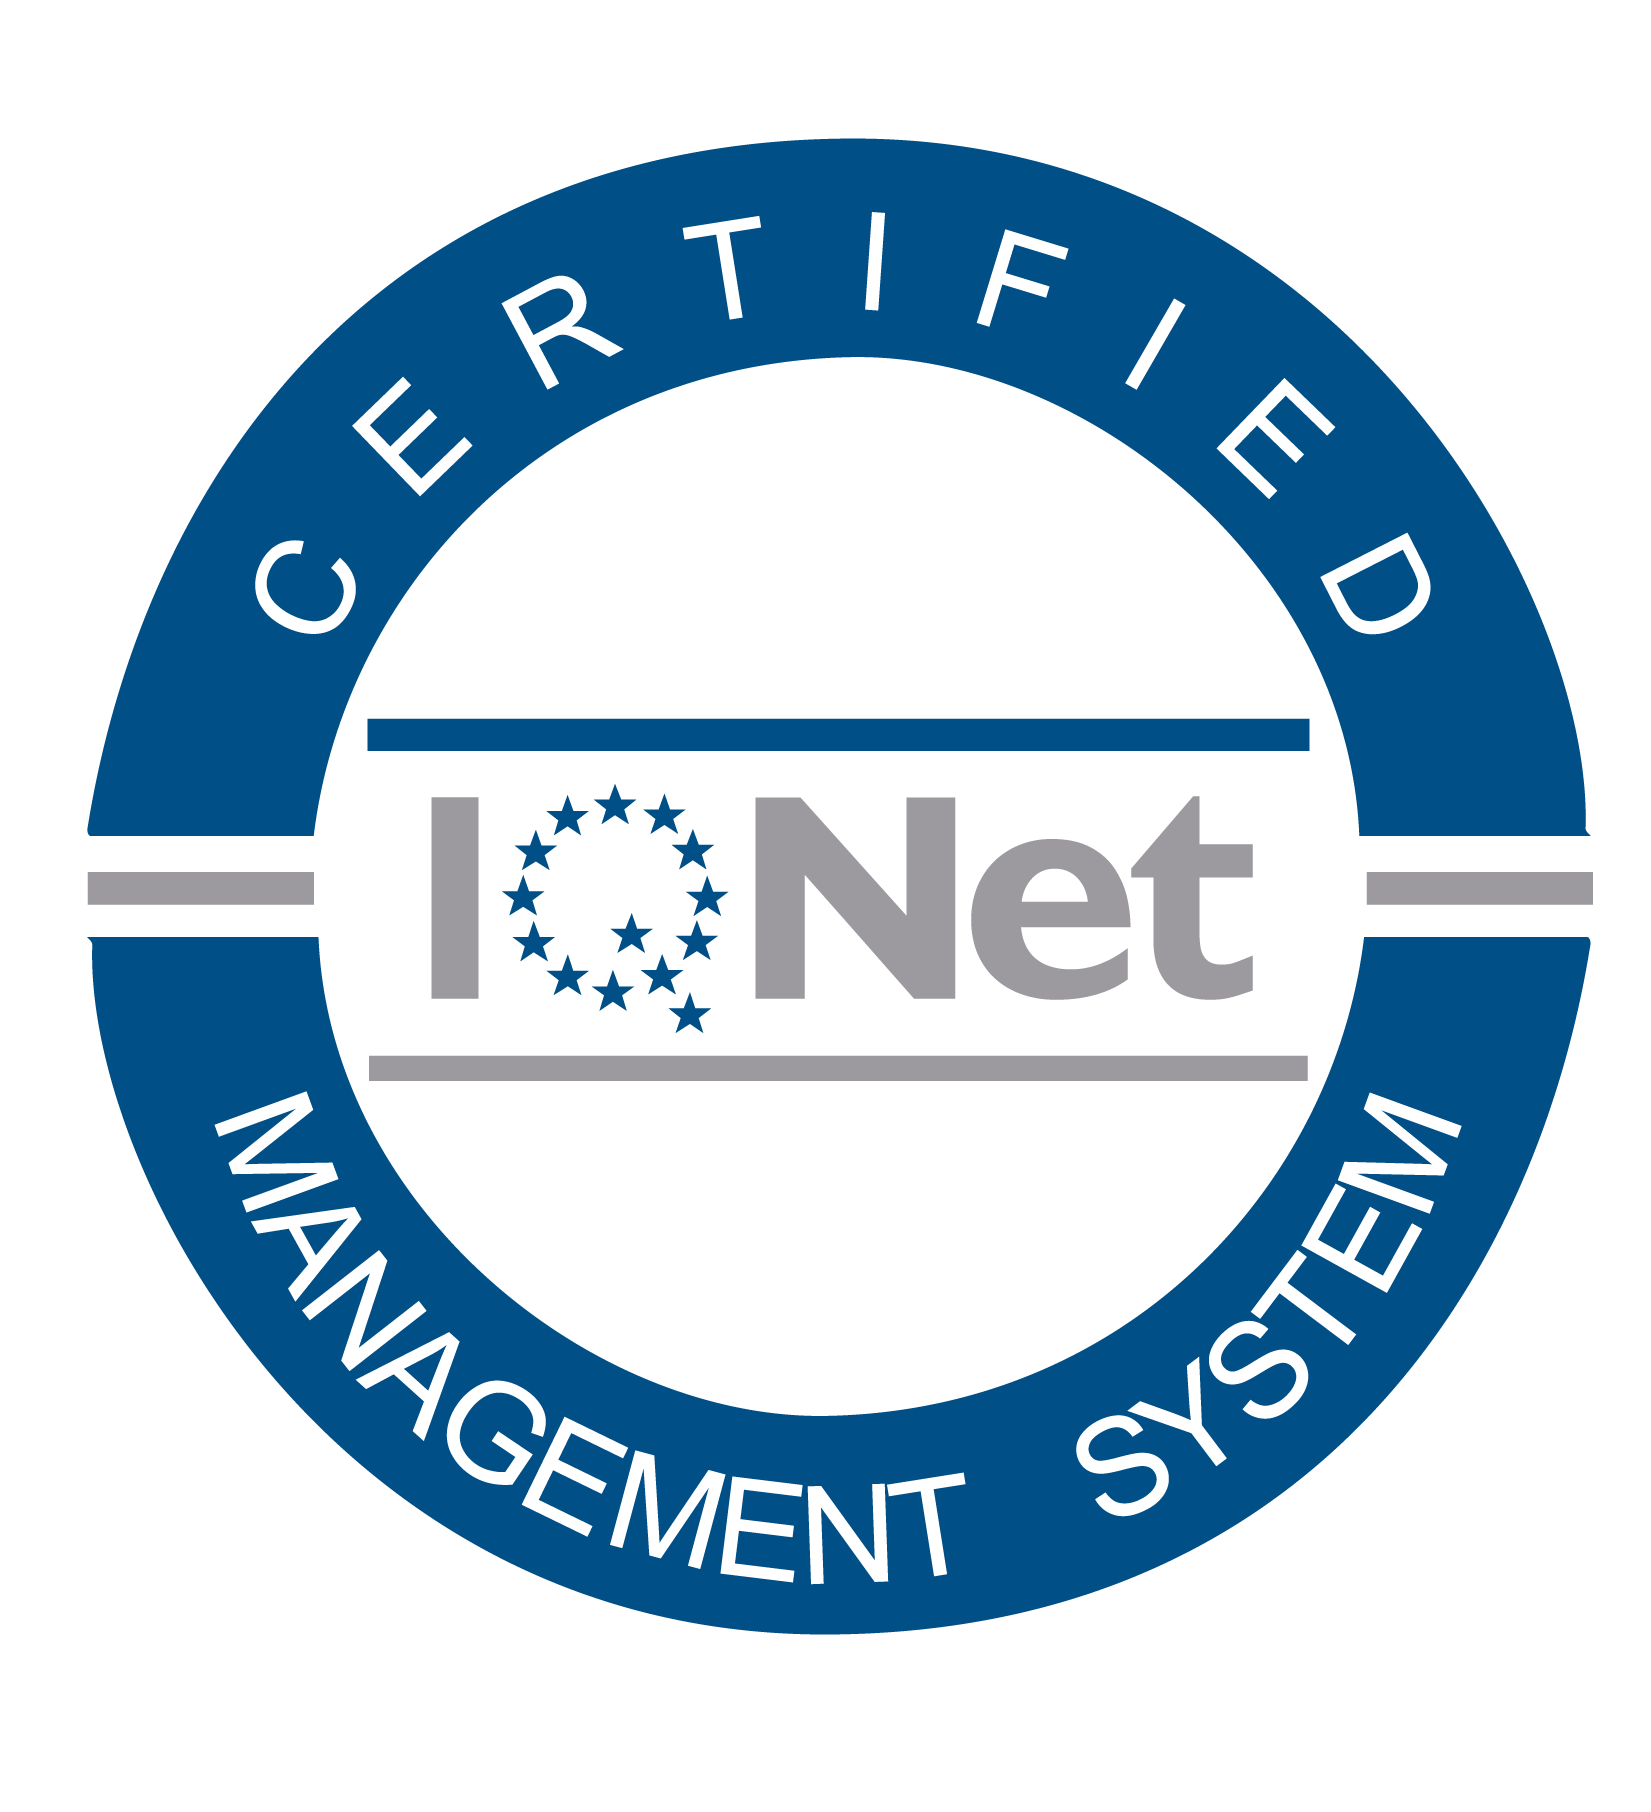 logos icontec-05